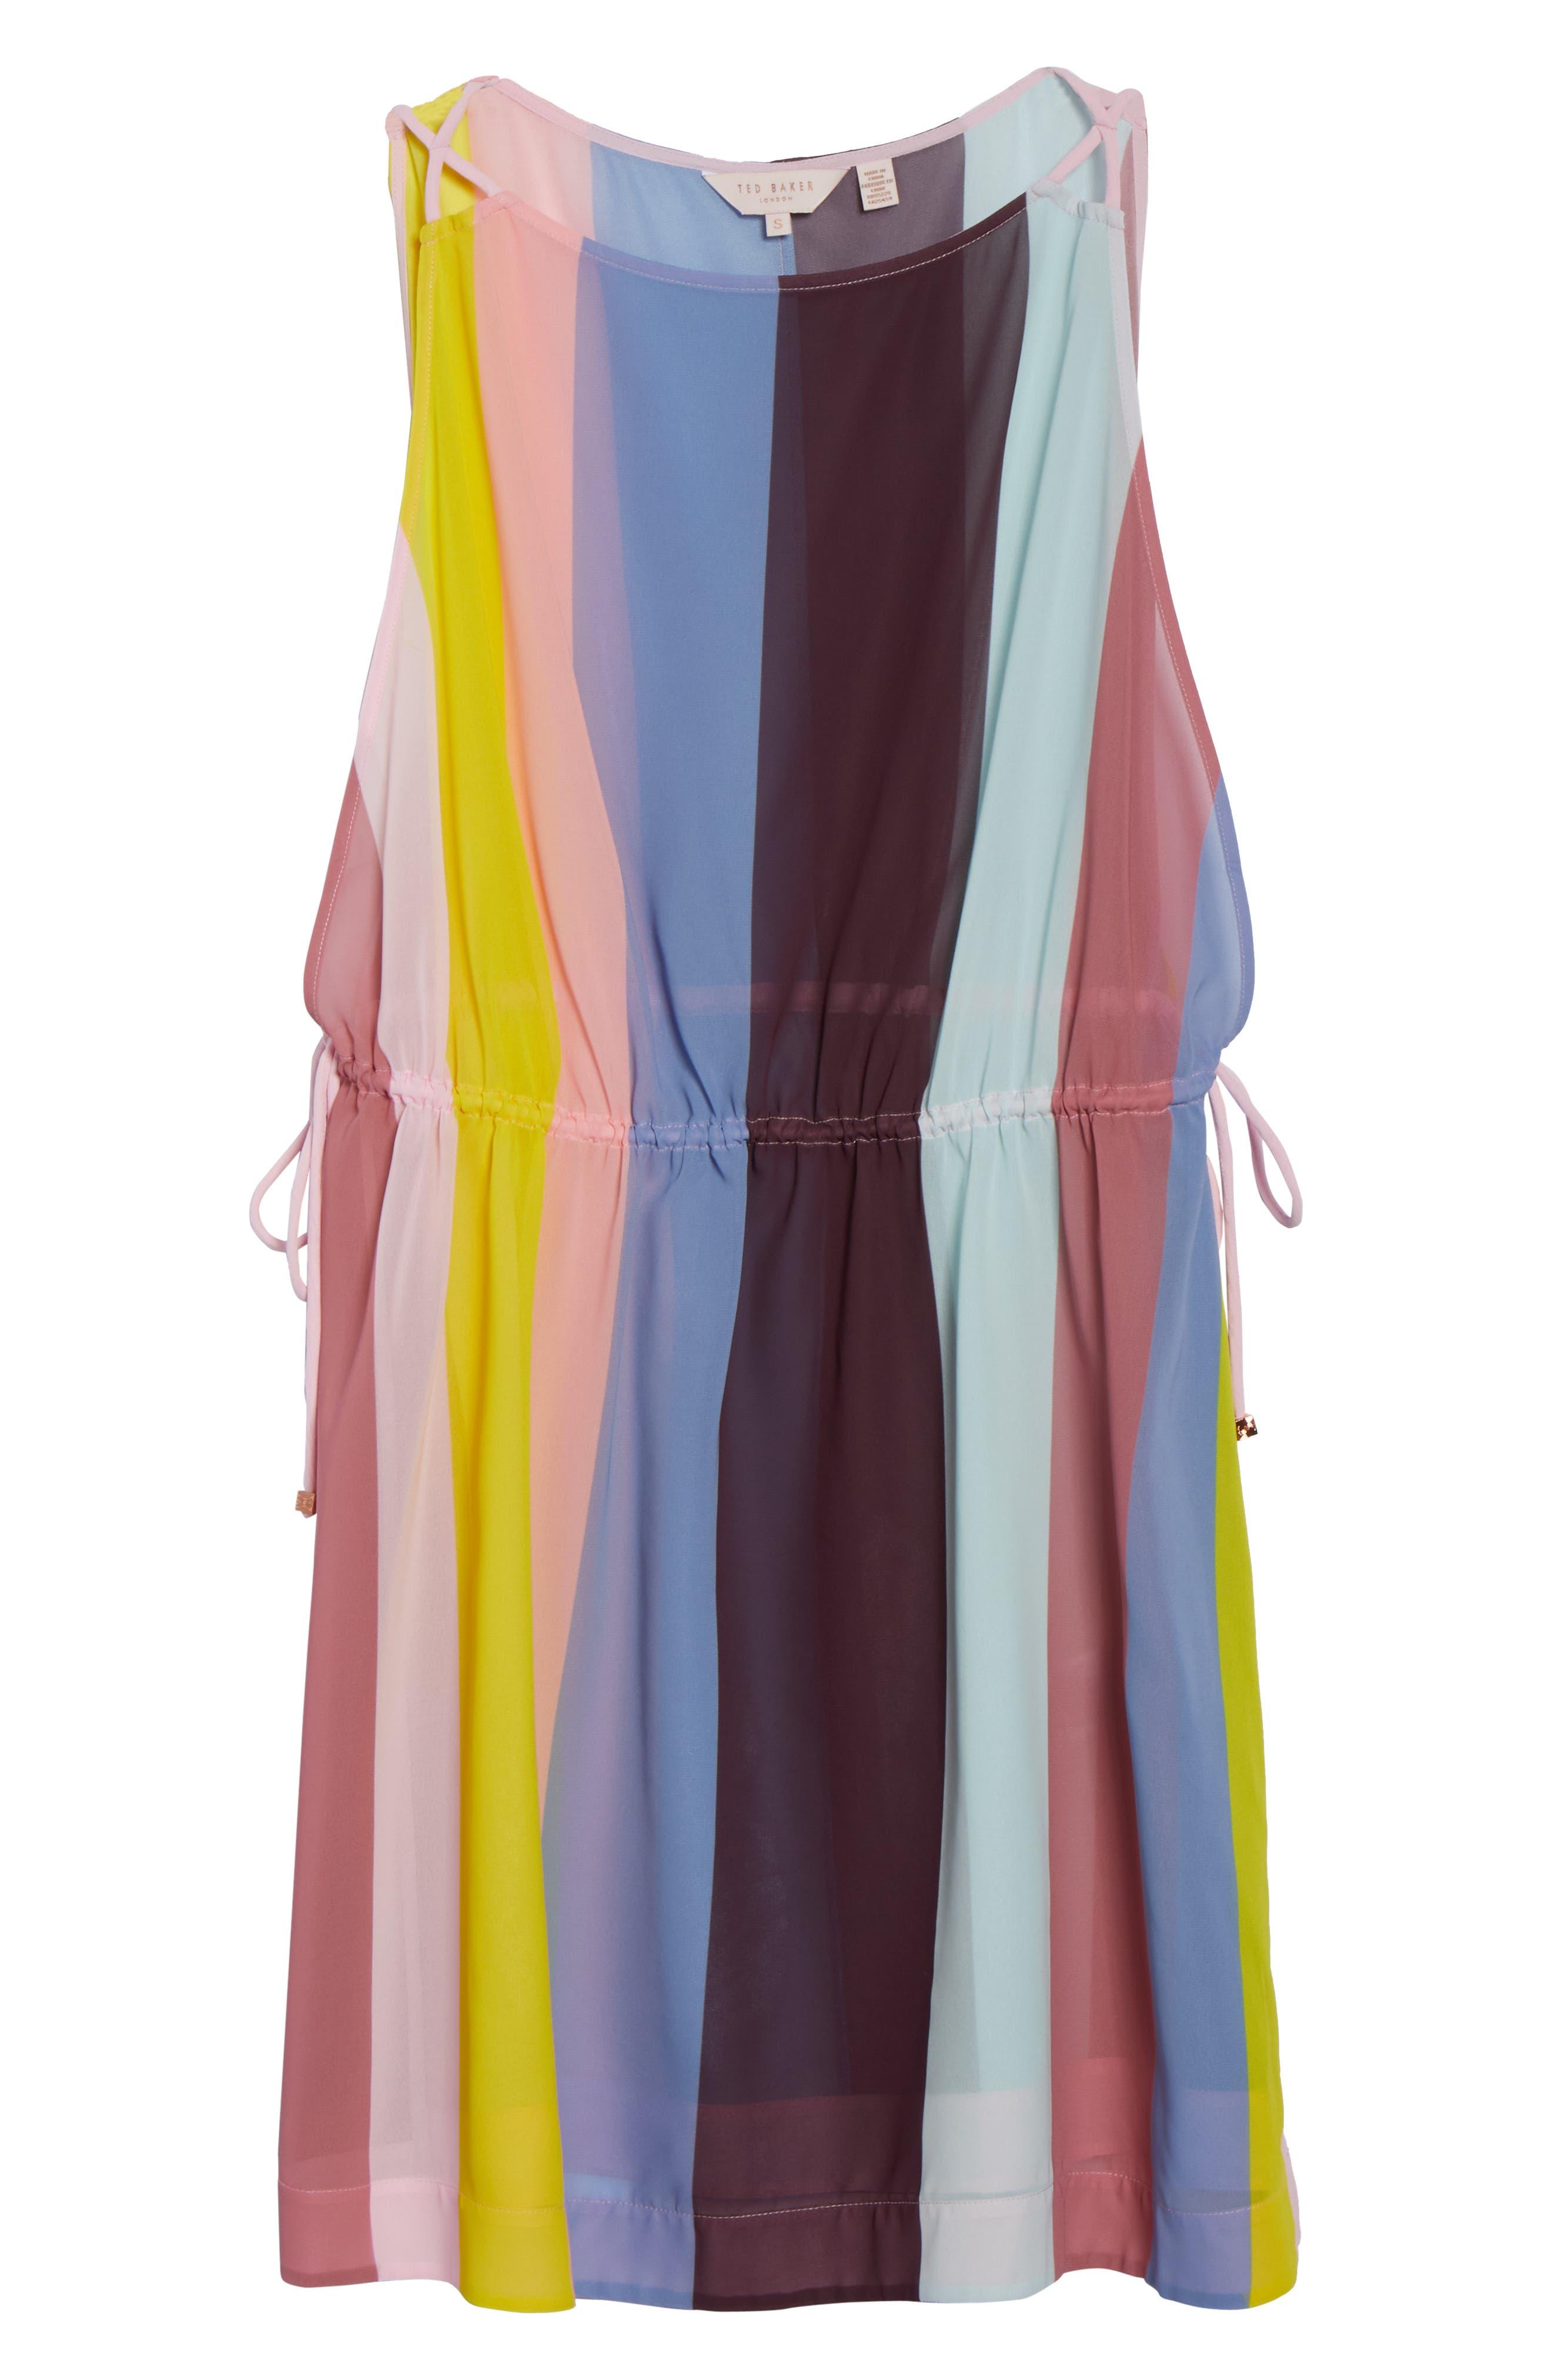 Penaree Rio Stripe Tabbard Cover-Up,                             Alternate thumbnail 6, color,                             LIGHT PINK